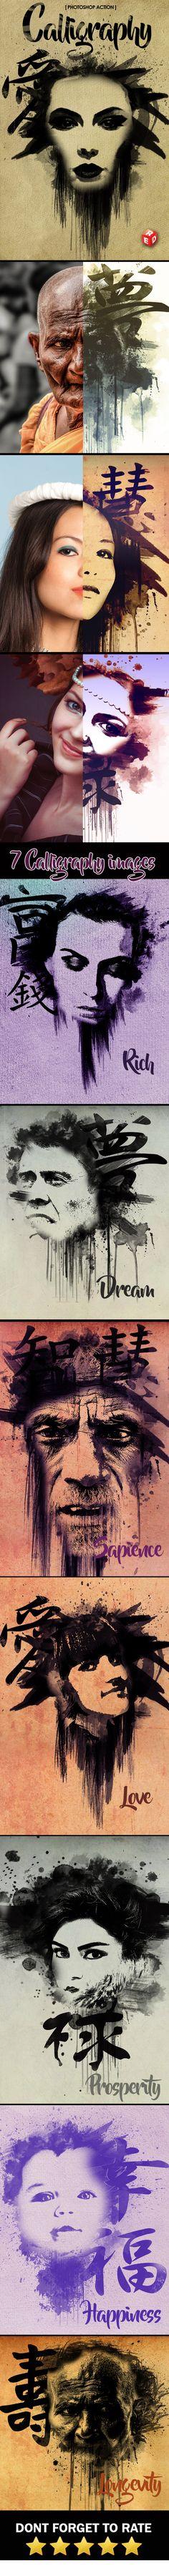 Calligraphy Photoshop Action - Actions Photoshop